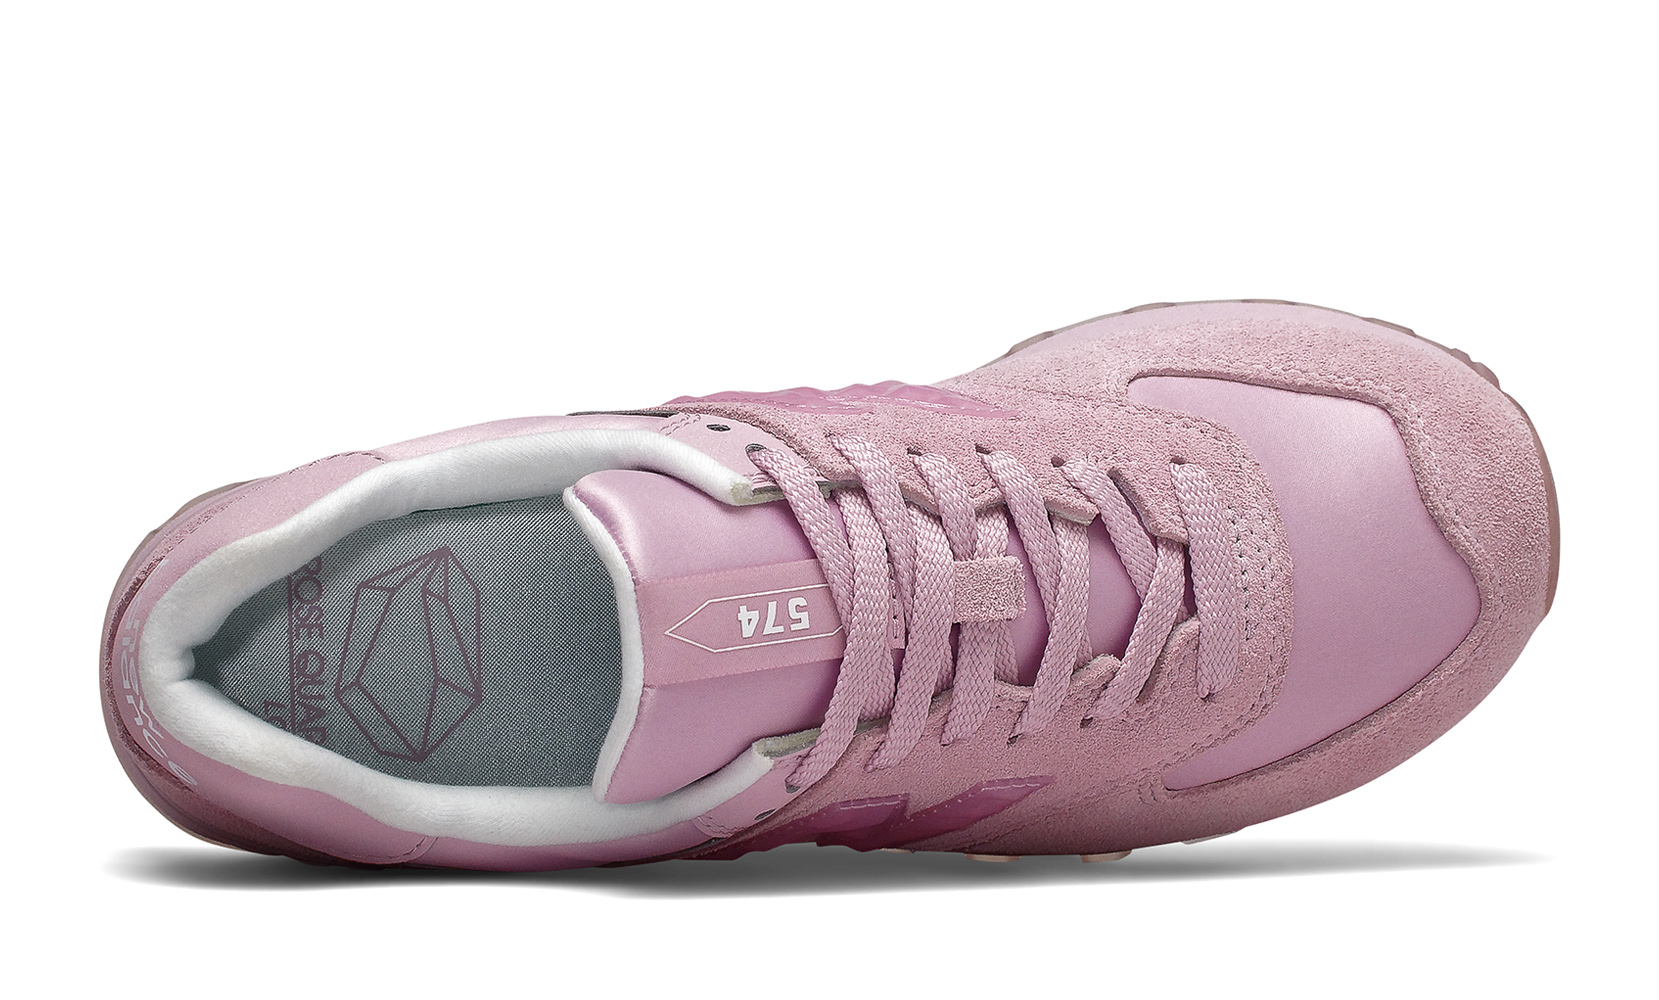 Жіноче взуття повсякденне New Balance 574 Mystic Crystal WL574WNU | New Balance